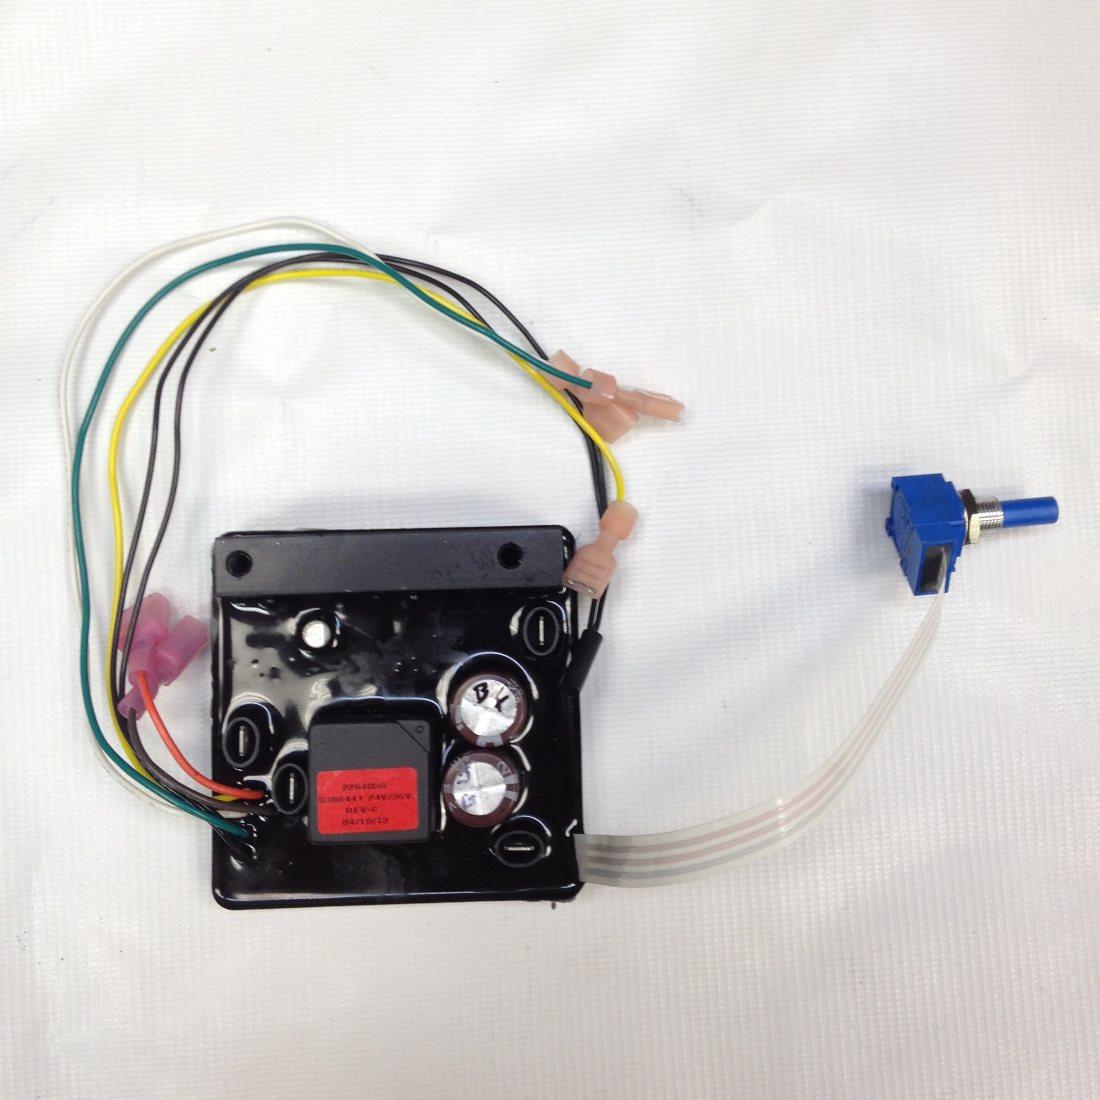 minn kota maxxum 12 volt control board upgrade price 179 95 image 1 larger more photos [ 1100 x 1100 Pixel ]